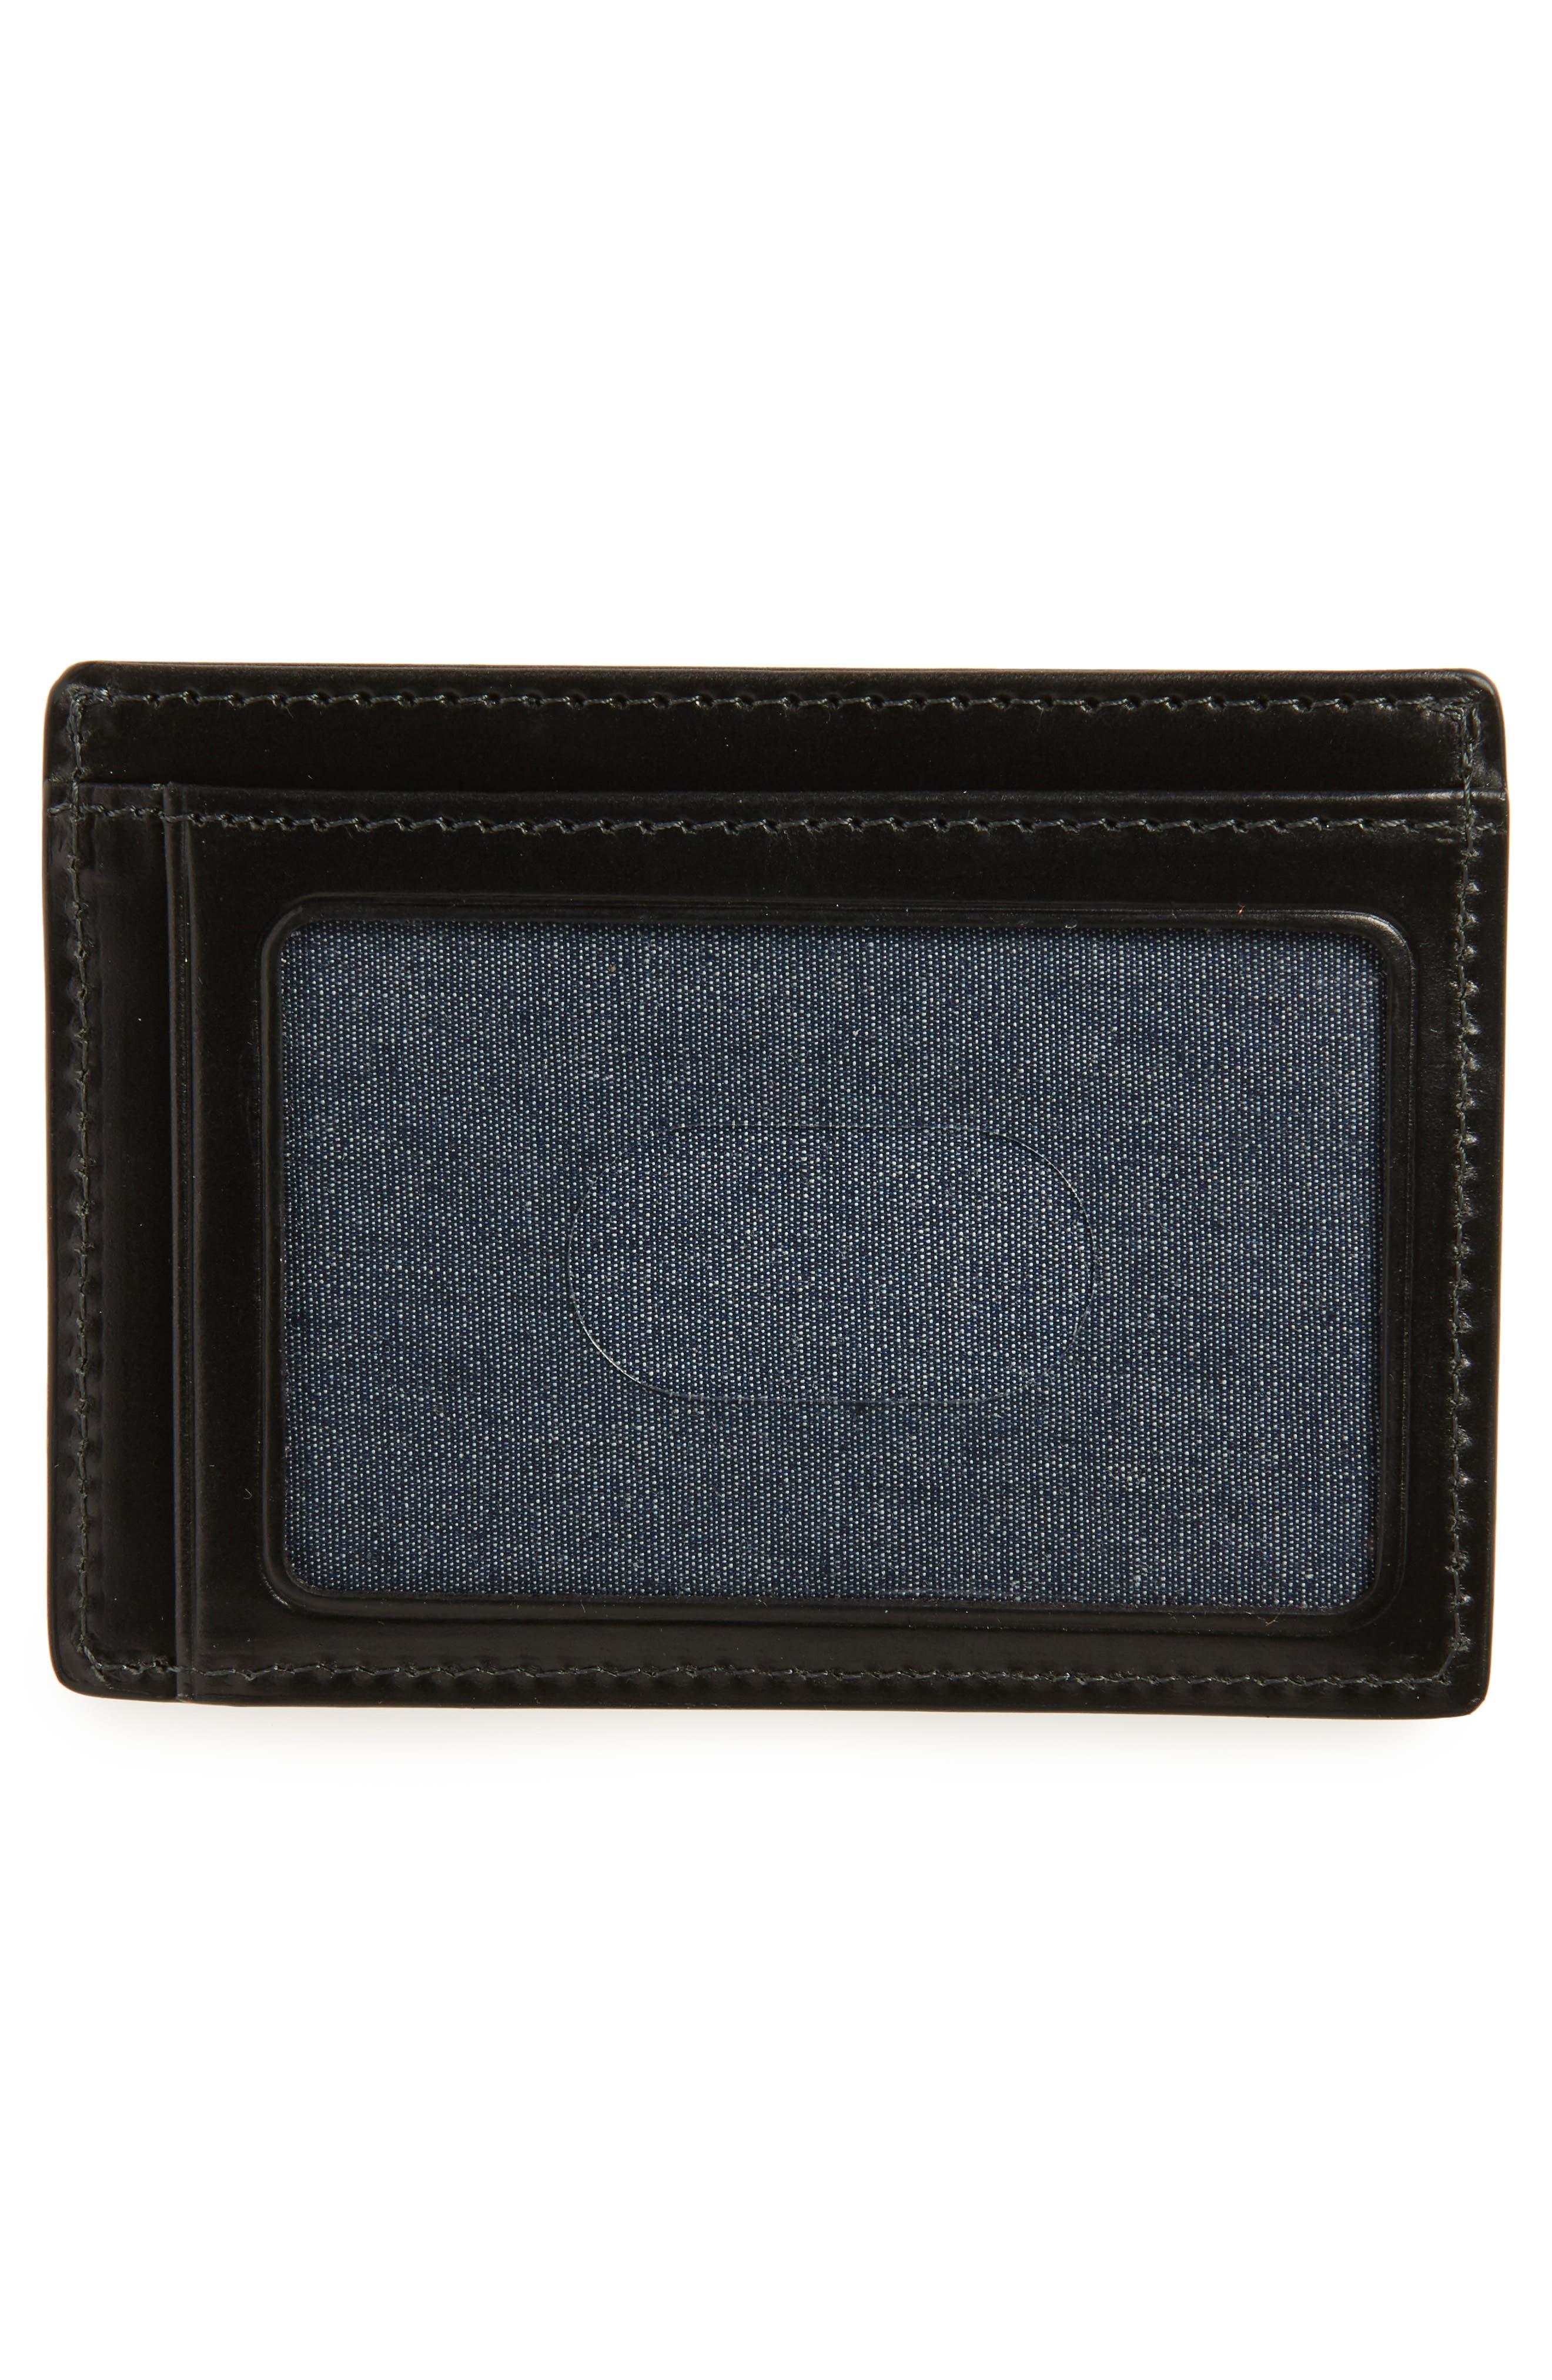 NORDSTROM MEN'S SHOP, Wyatt RFID Card Case, Alternate thumbnail 2, color, BLACK